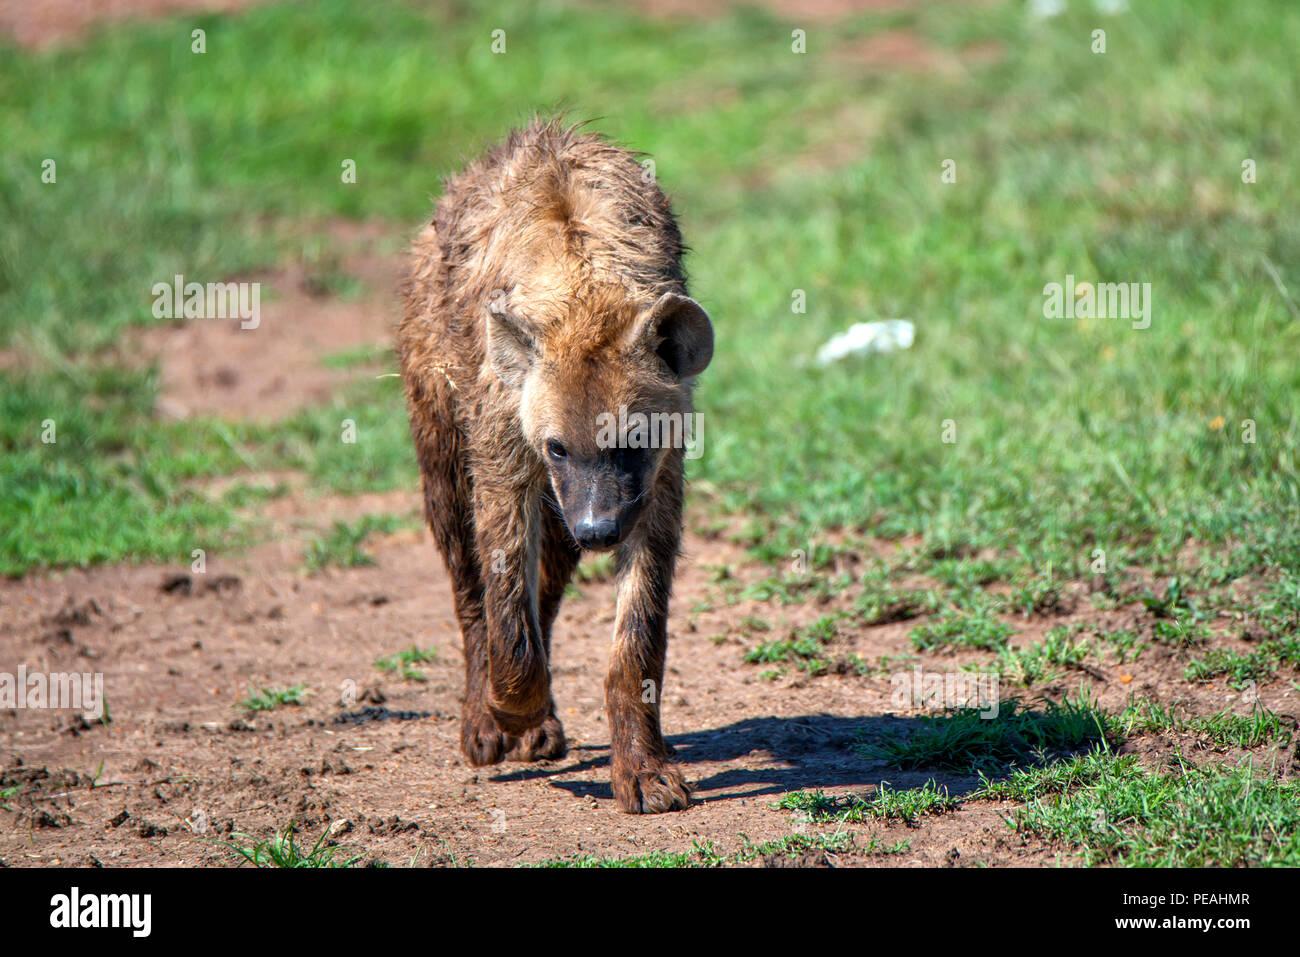 Spotted hyena or crocuta walks in savannah - Stock Image